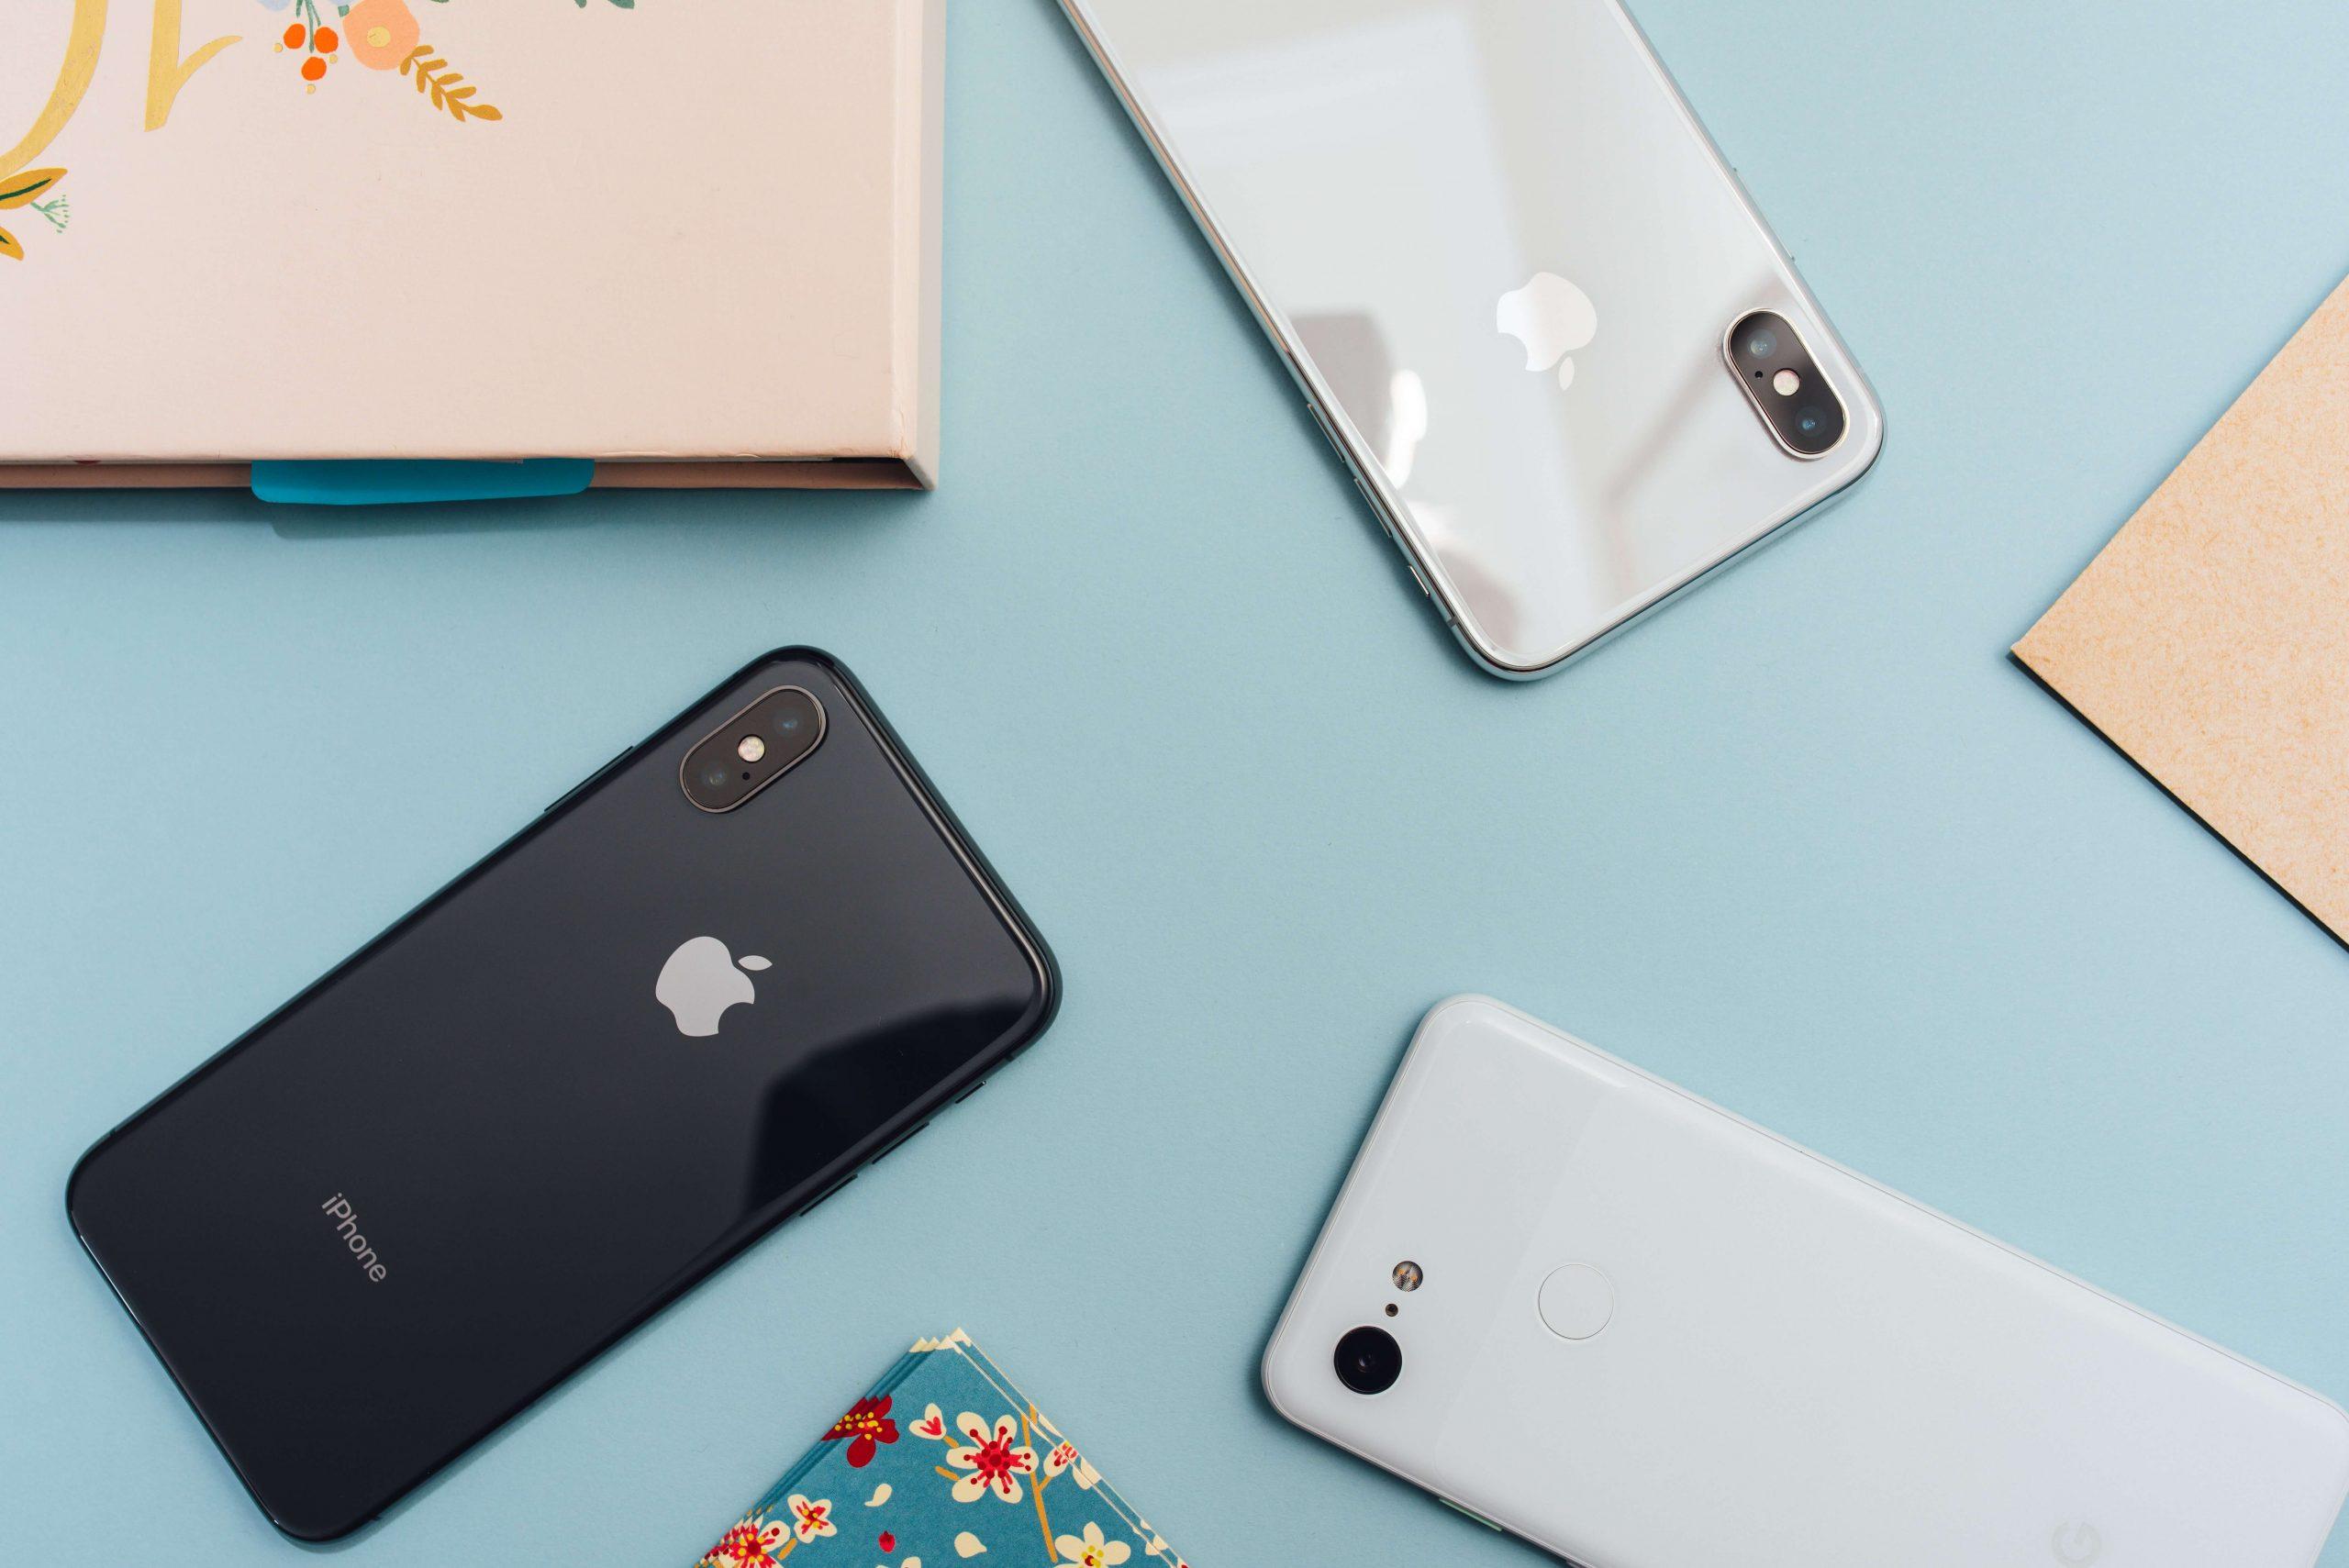 IPhones - Mobile Phone Website Design